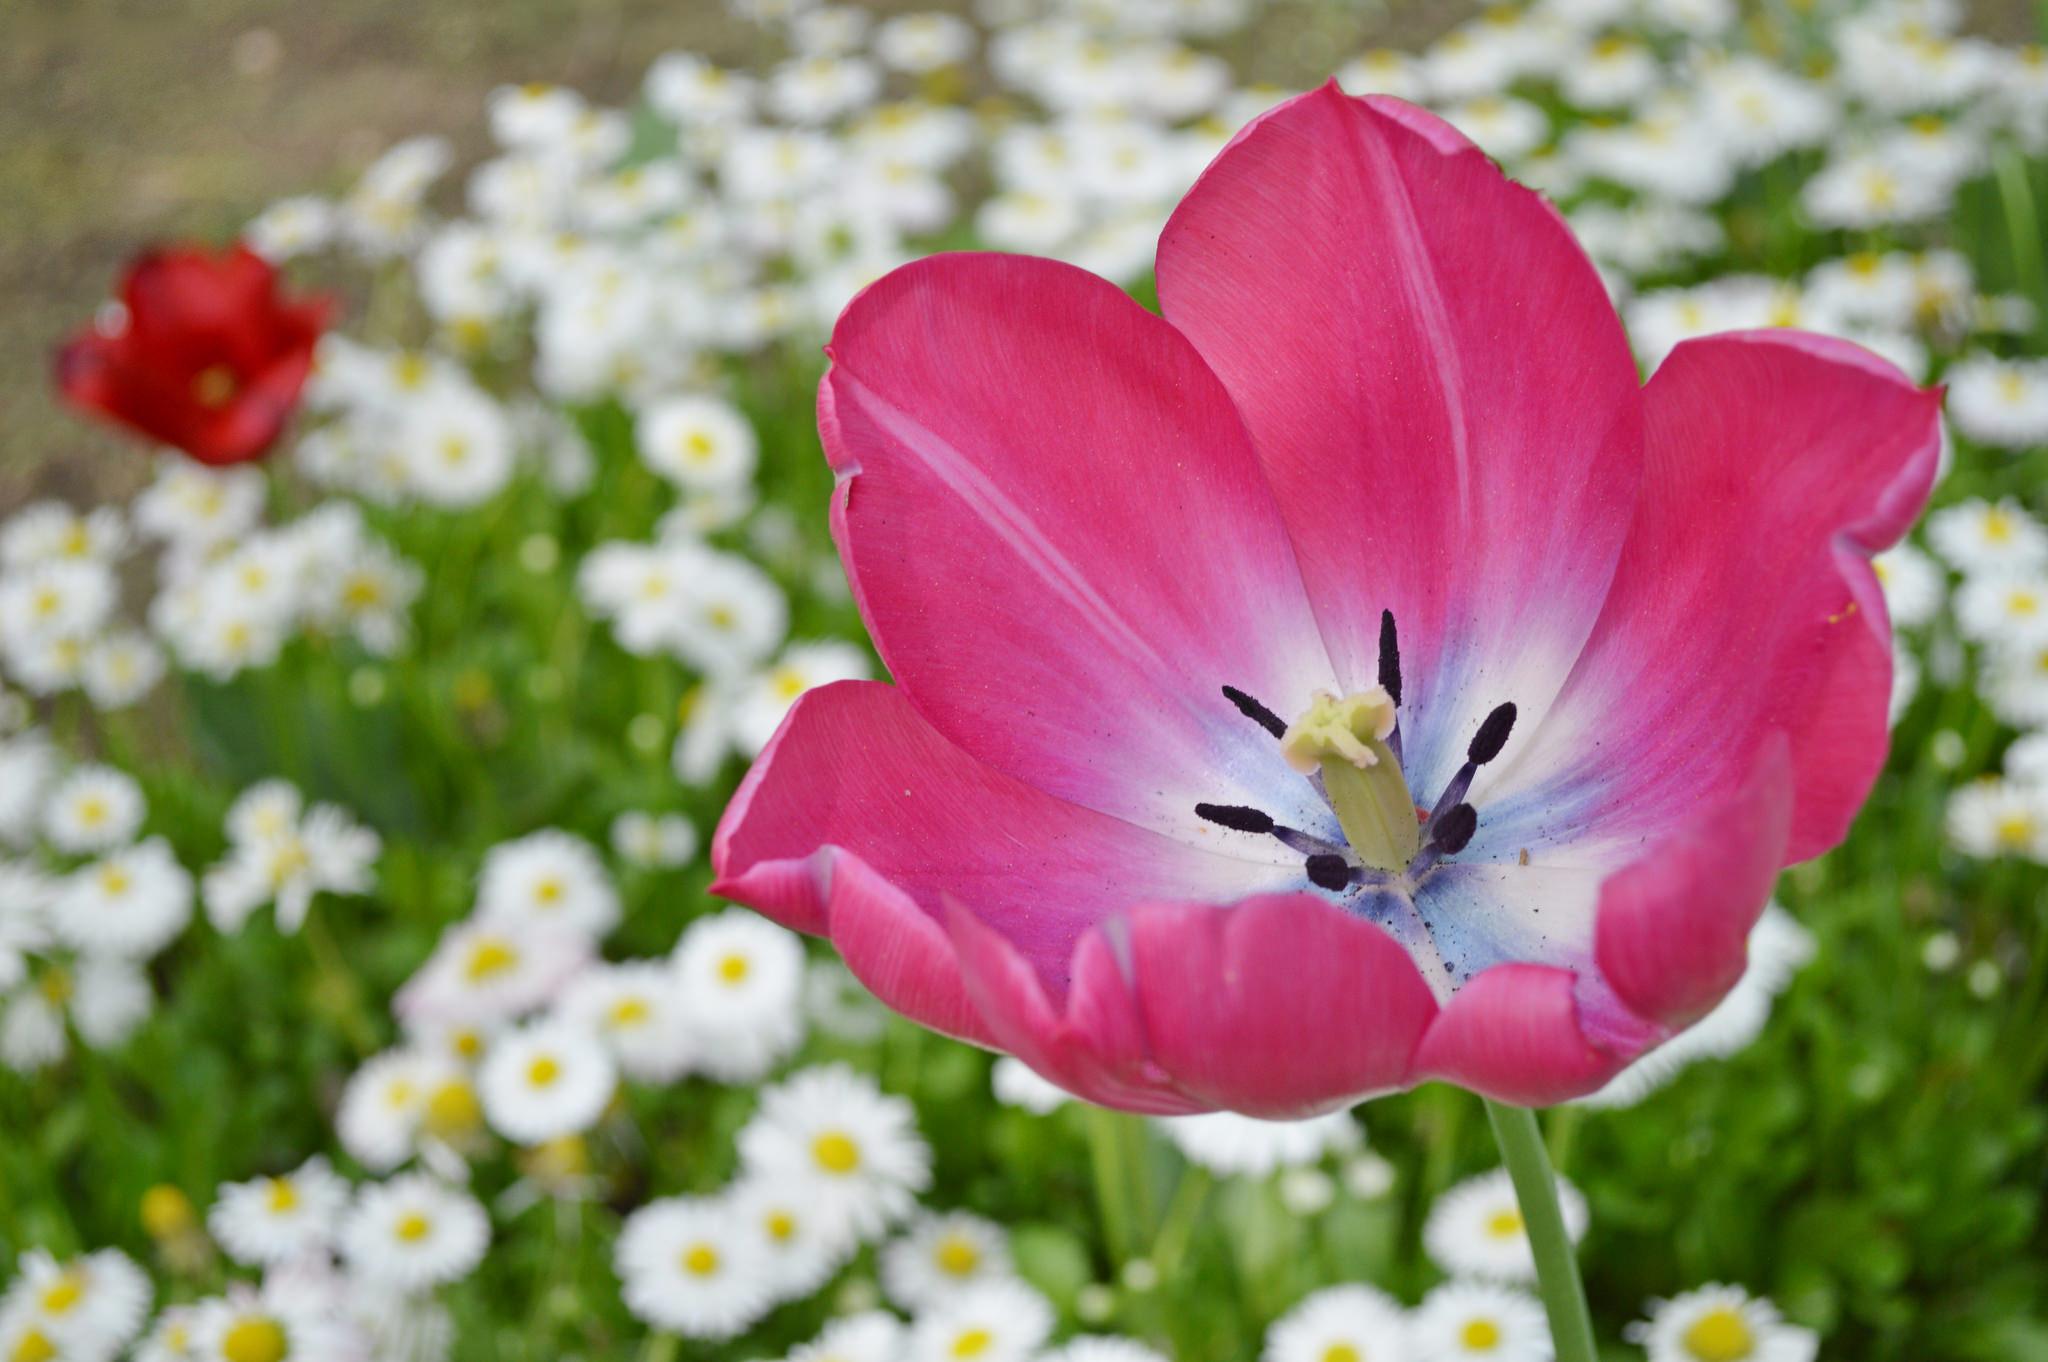 Daisy Flower Petal Tulip 2048x1362